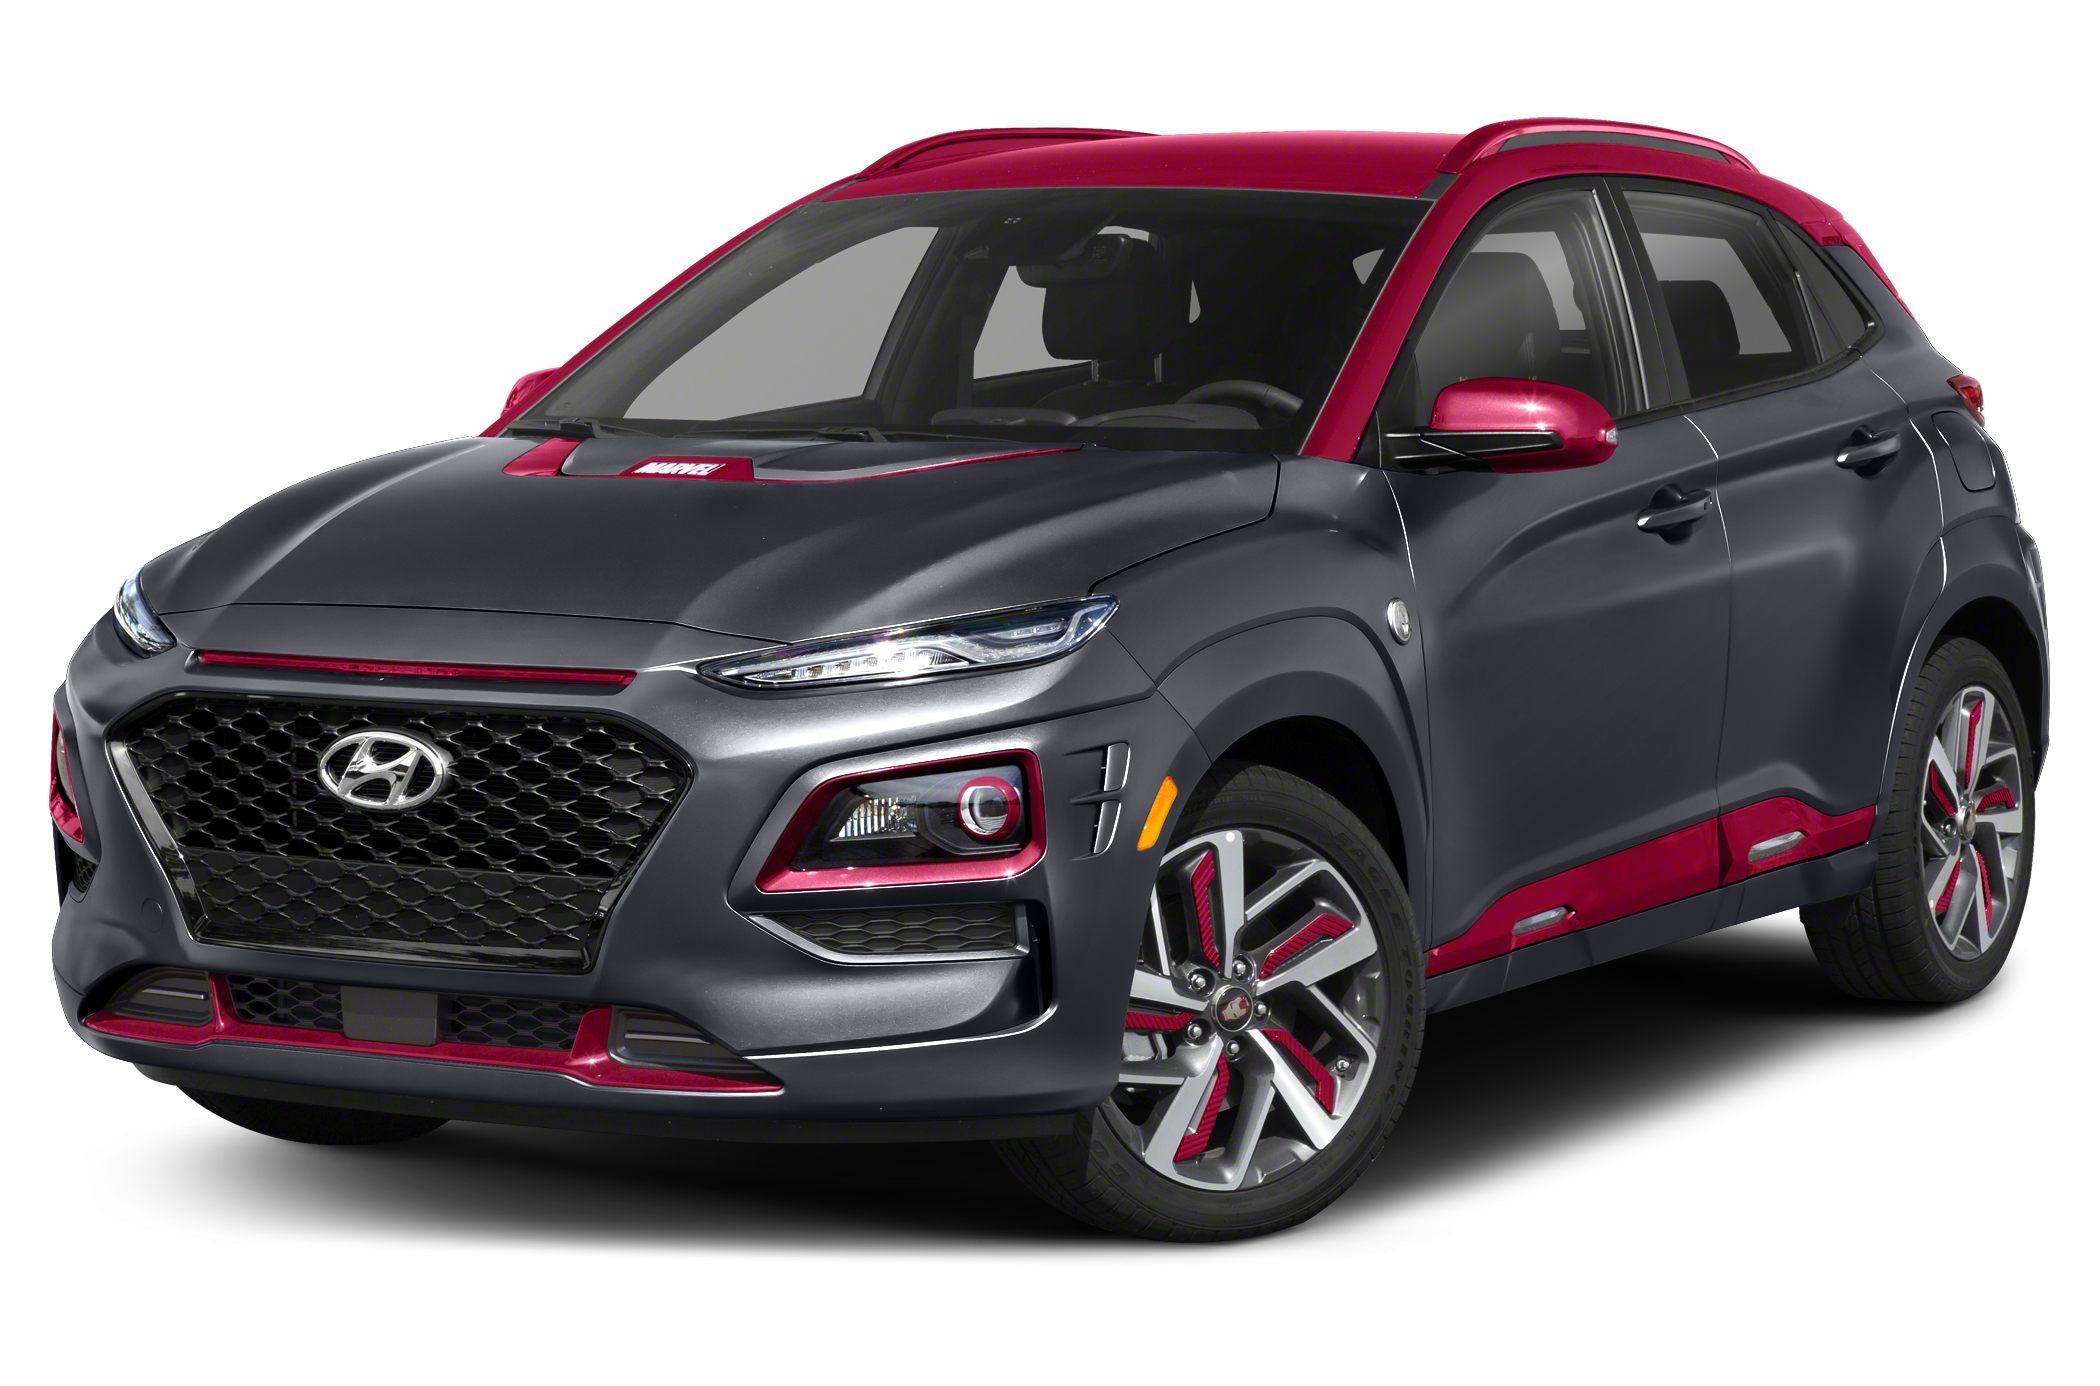 2019 Hyundai Kona Iron Man 4dr All Wheel Drive Specs And Prices